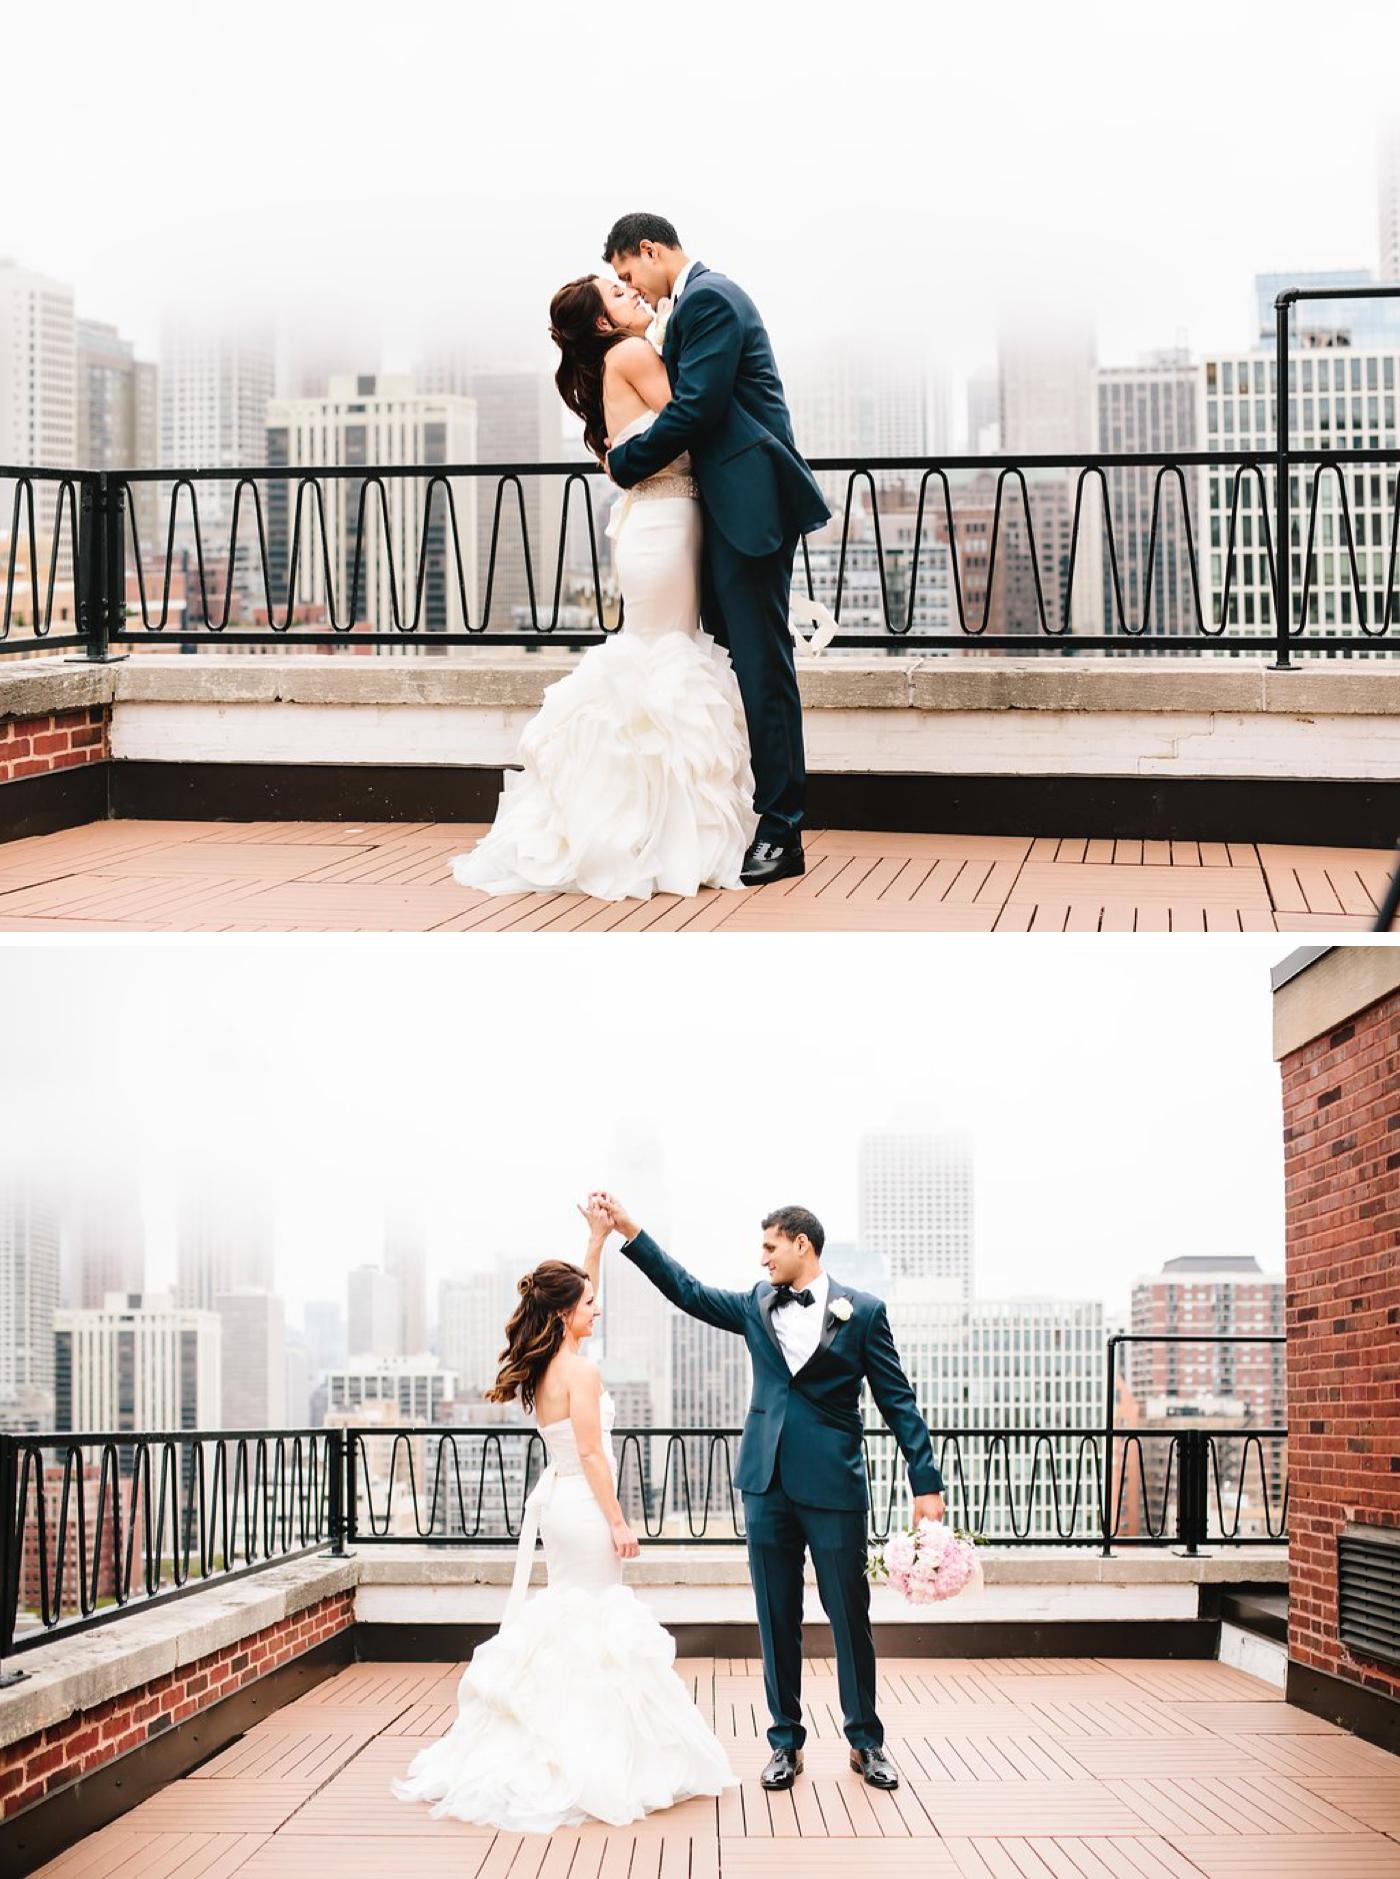 chicago-fine-art-wedding-photography-sakamuri22